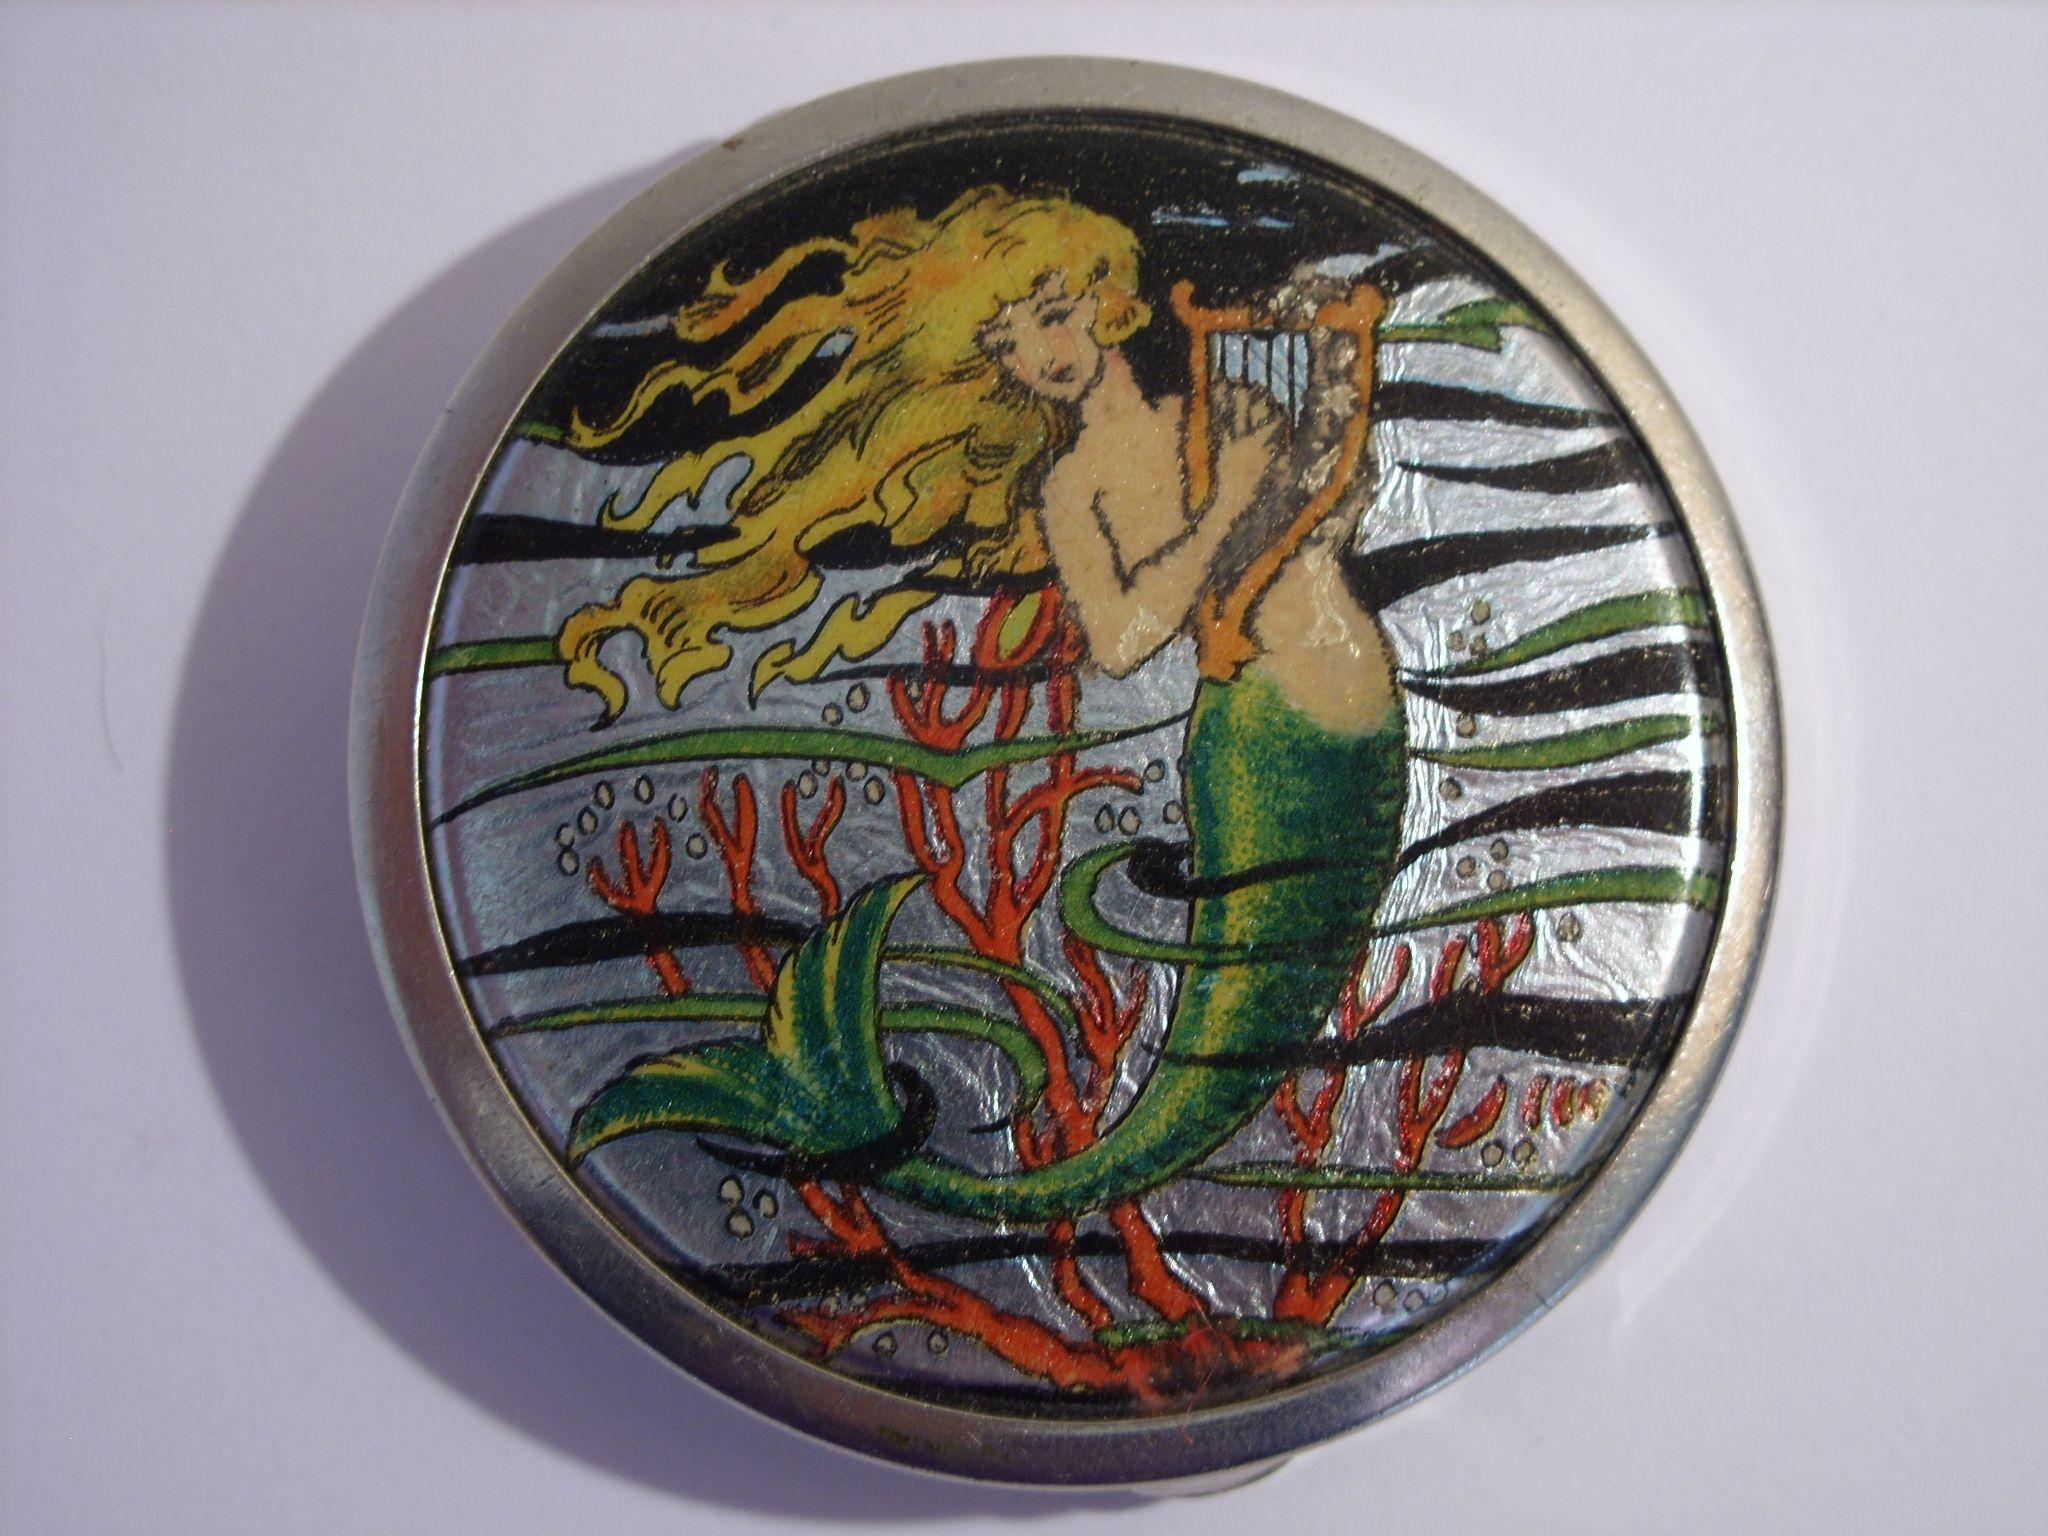 Art deco Stratnoid (early Stratton) foil mermaid powder compact.